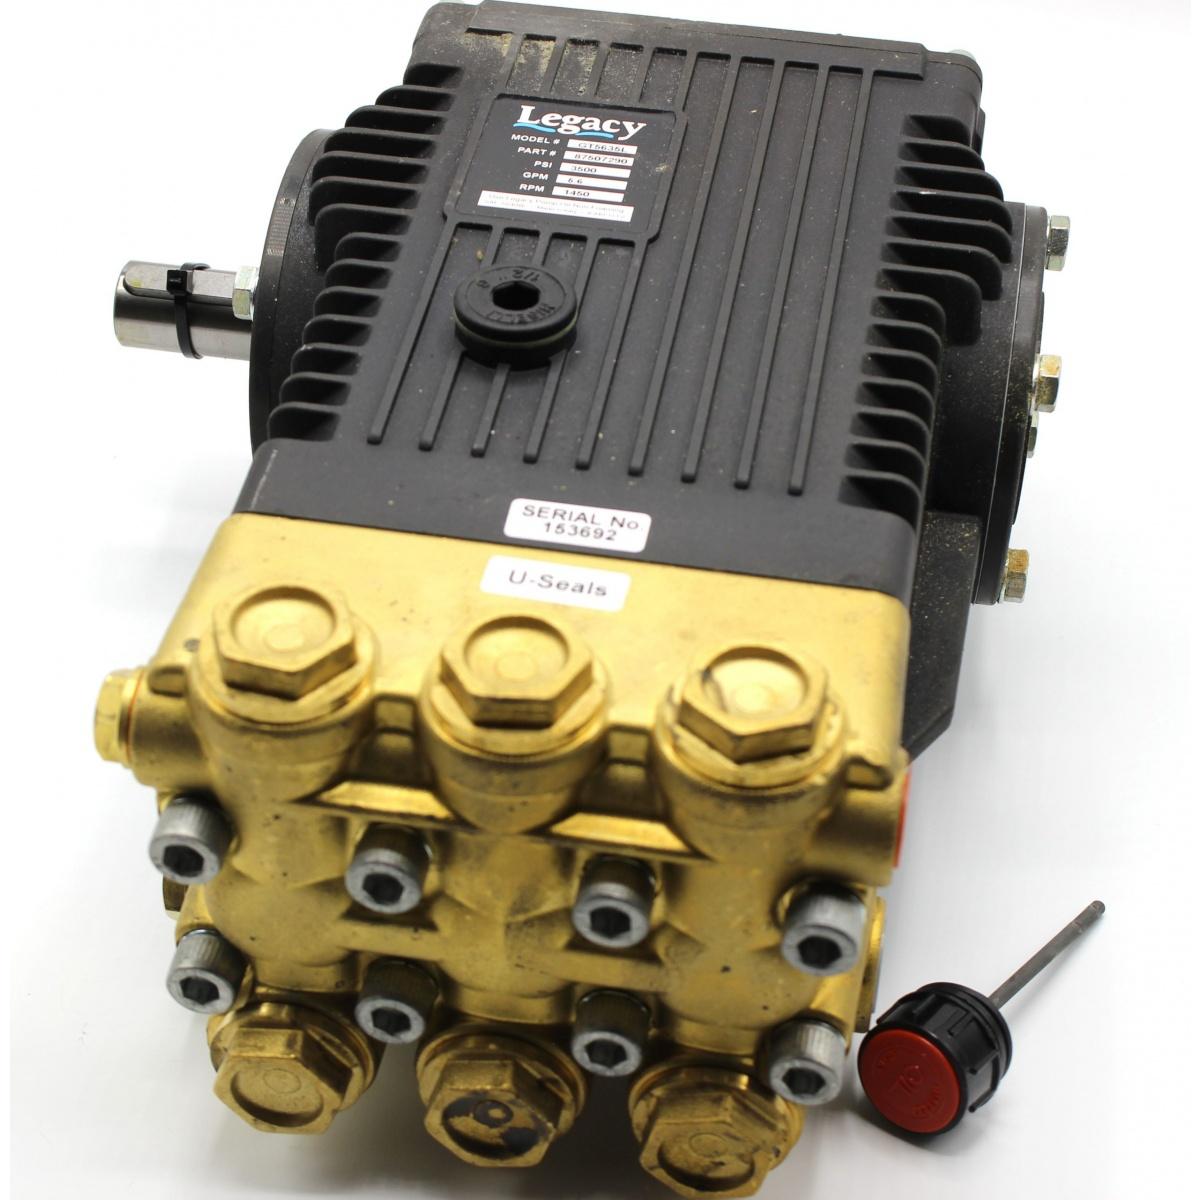 Pump, Legacy Gt5635l, 5.6@3500, 1450rpm